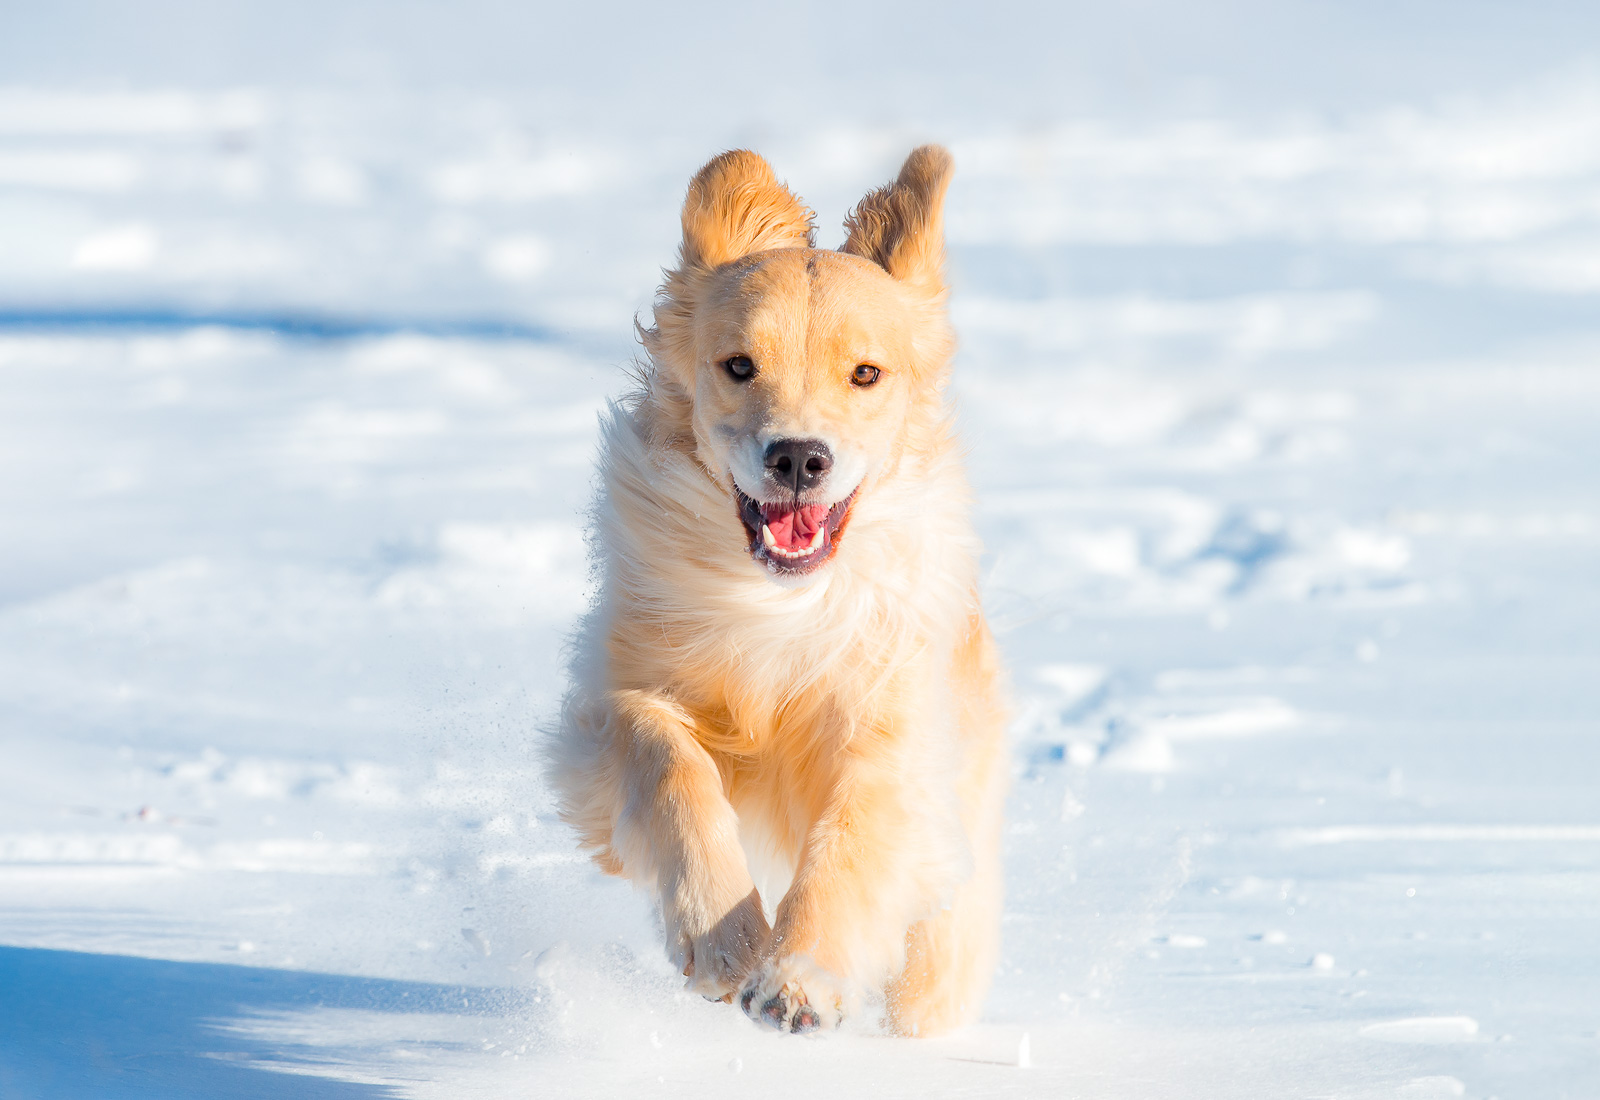 Golden Retriever running in the snow